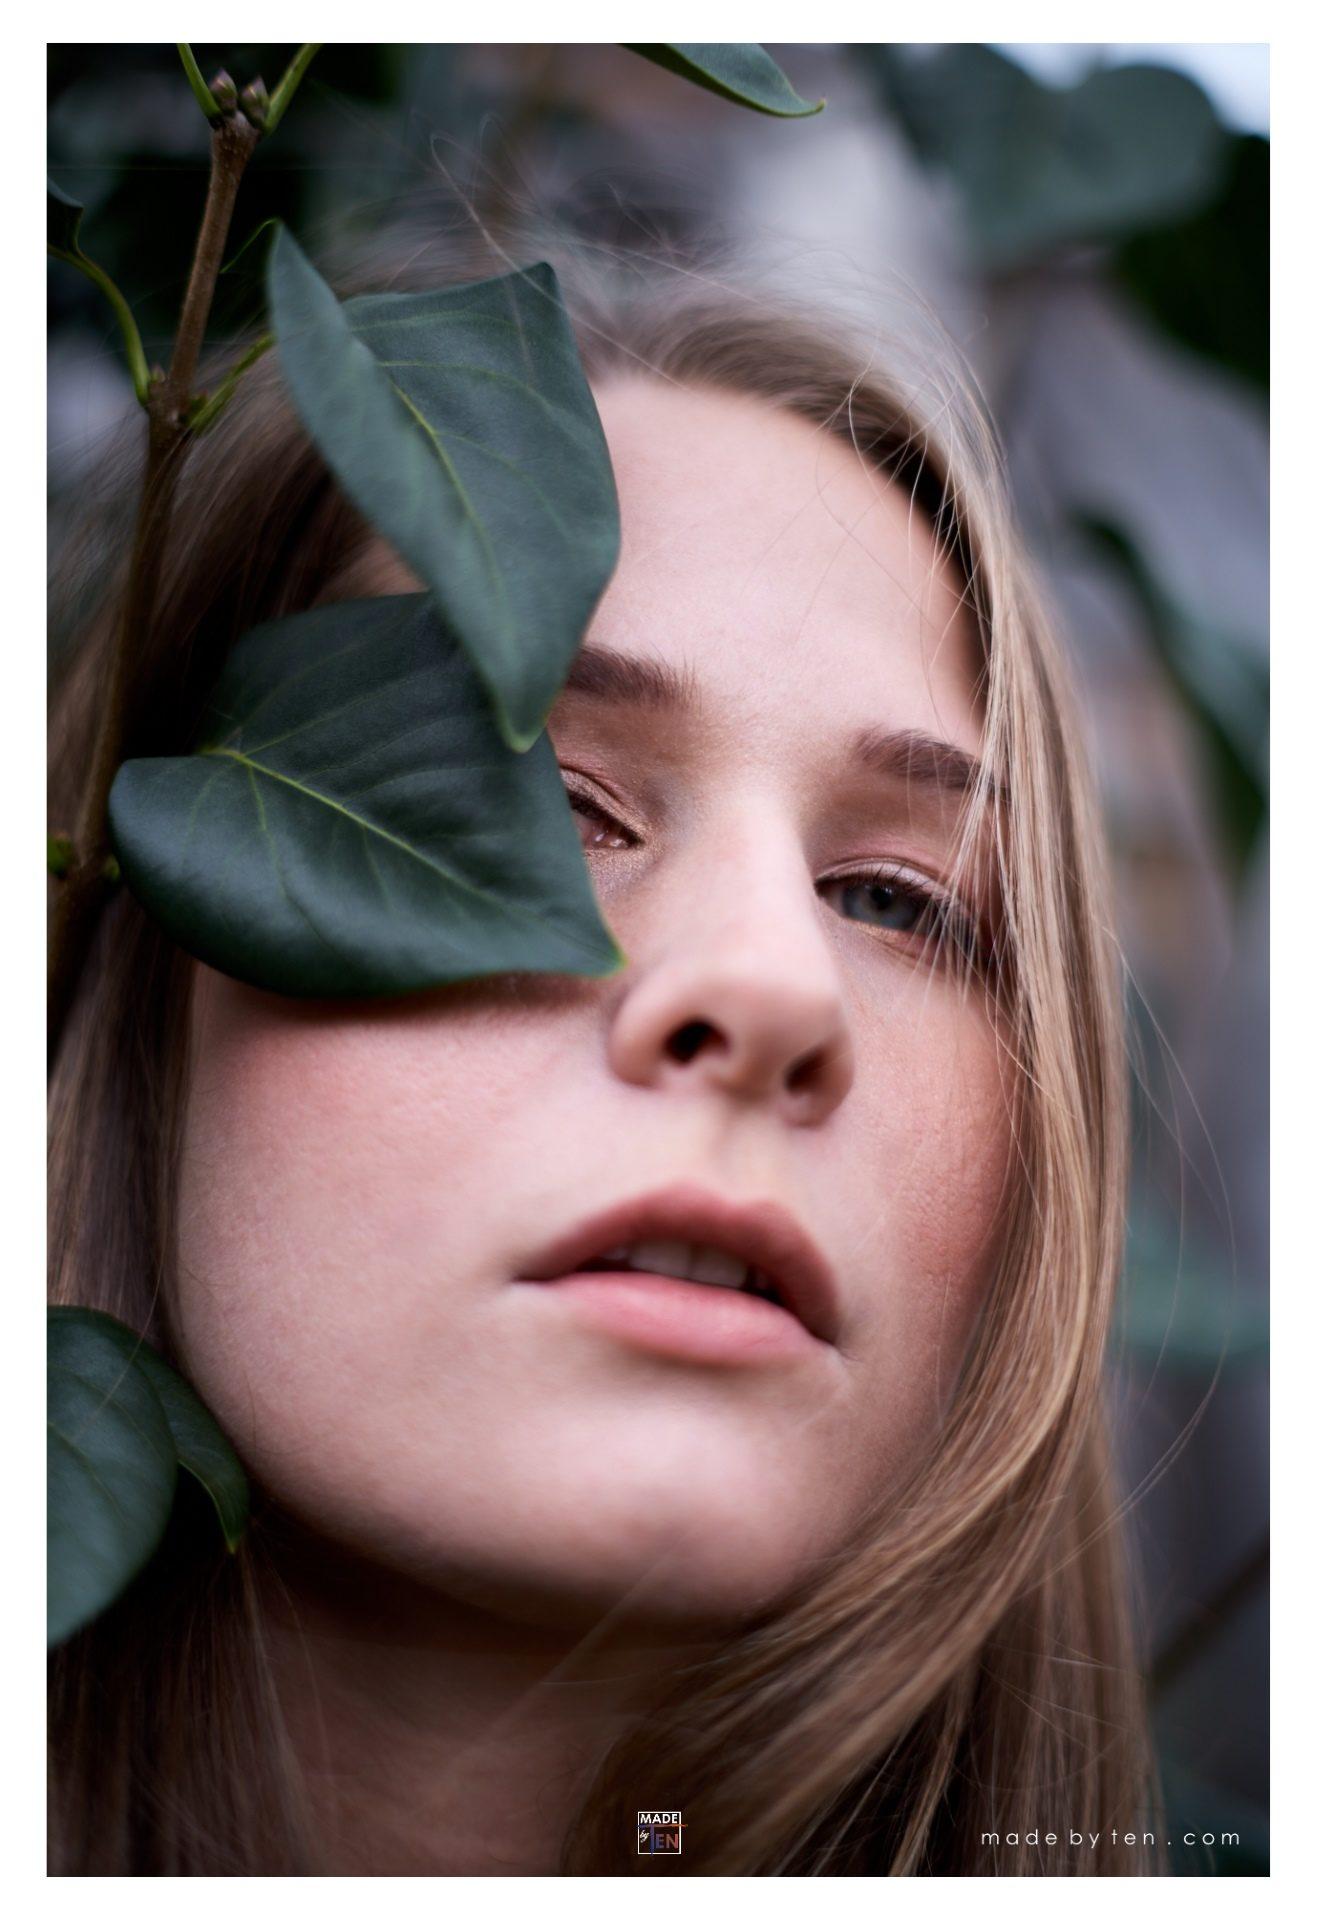 Leaf Over Eye - GTA Women Art Photography